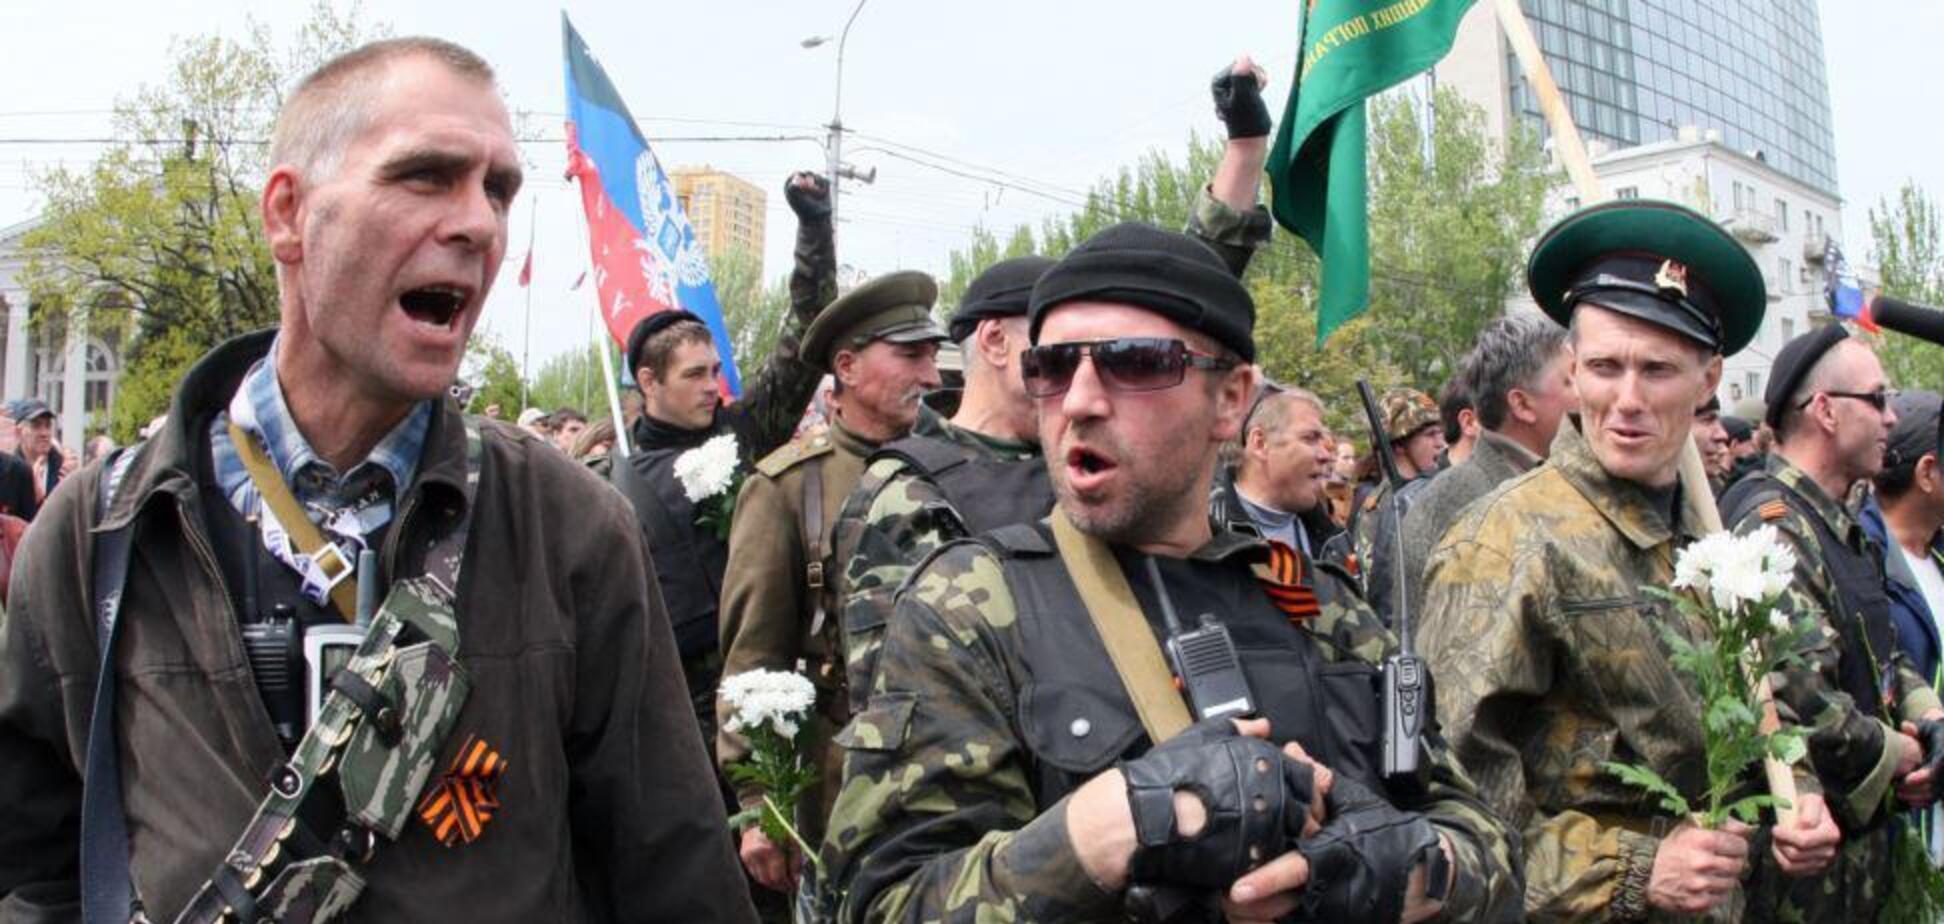 'До скорого в 200-х!' ВСУ эффектно запугали террористов на Донбассе. Фото